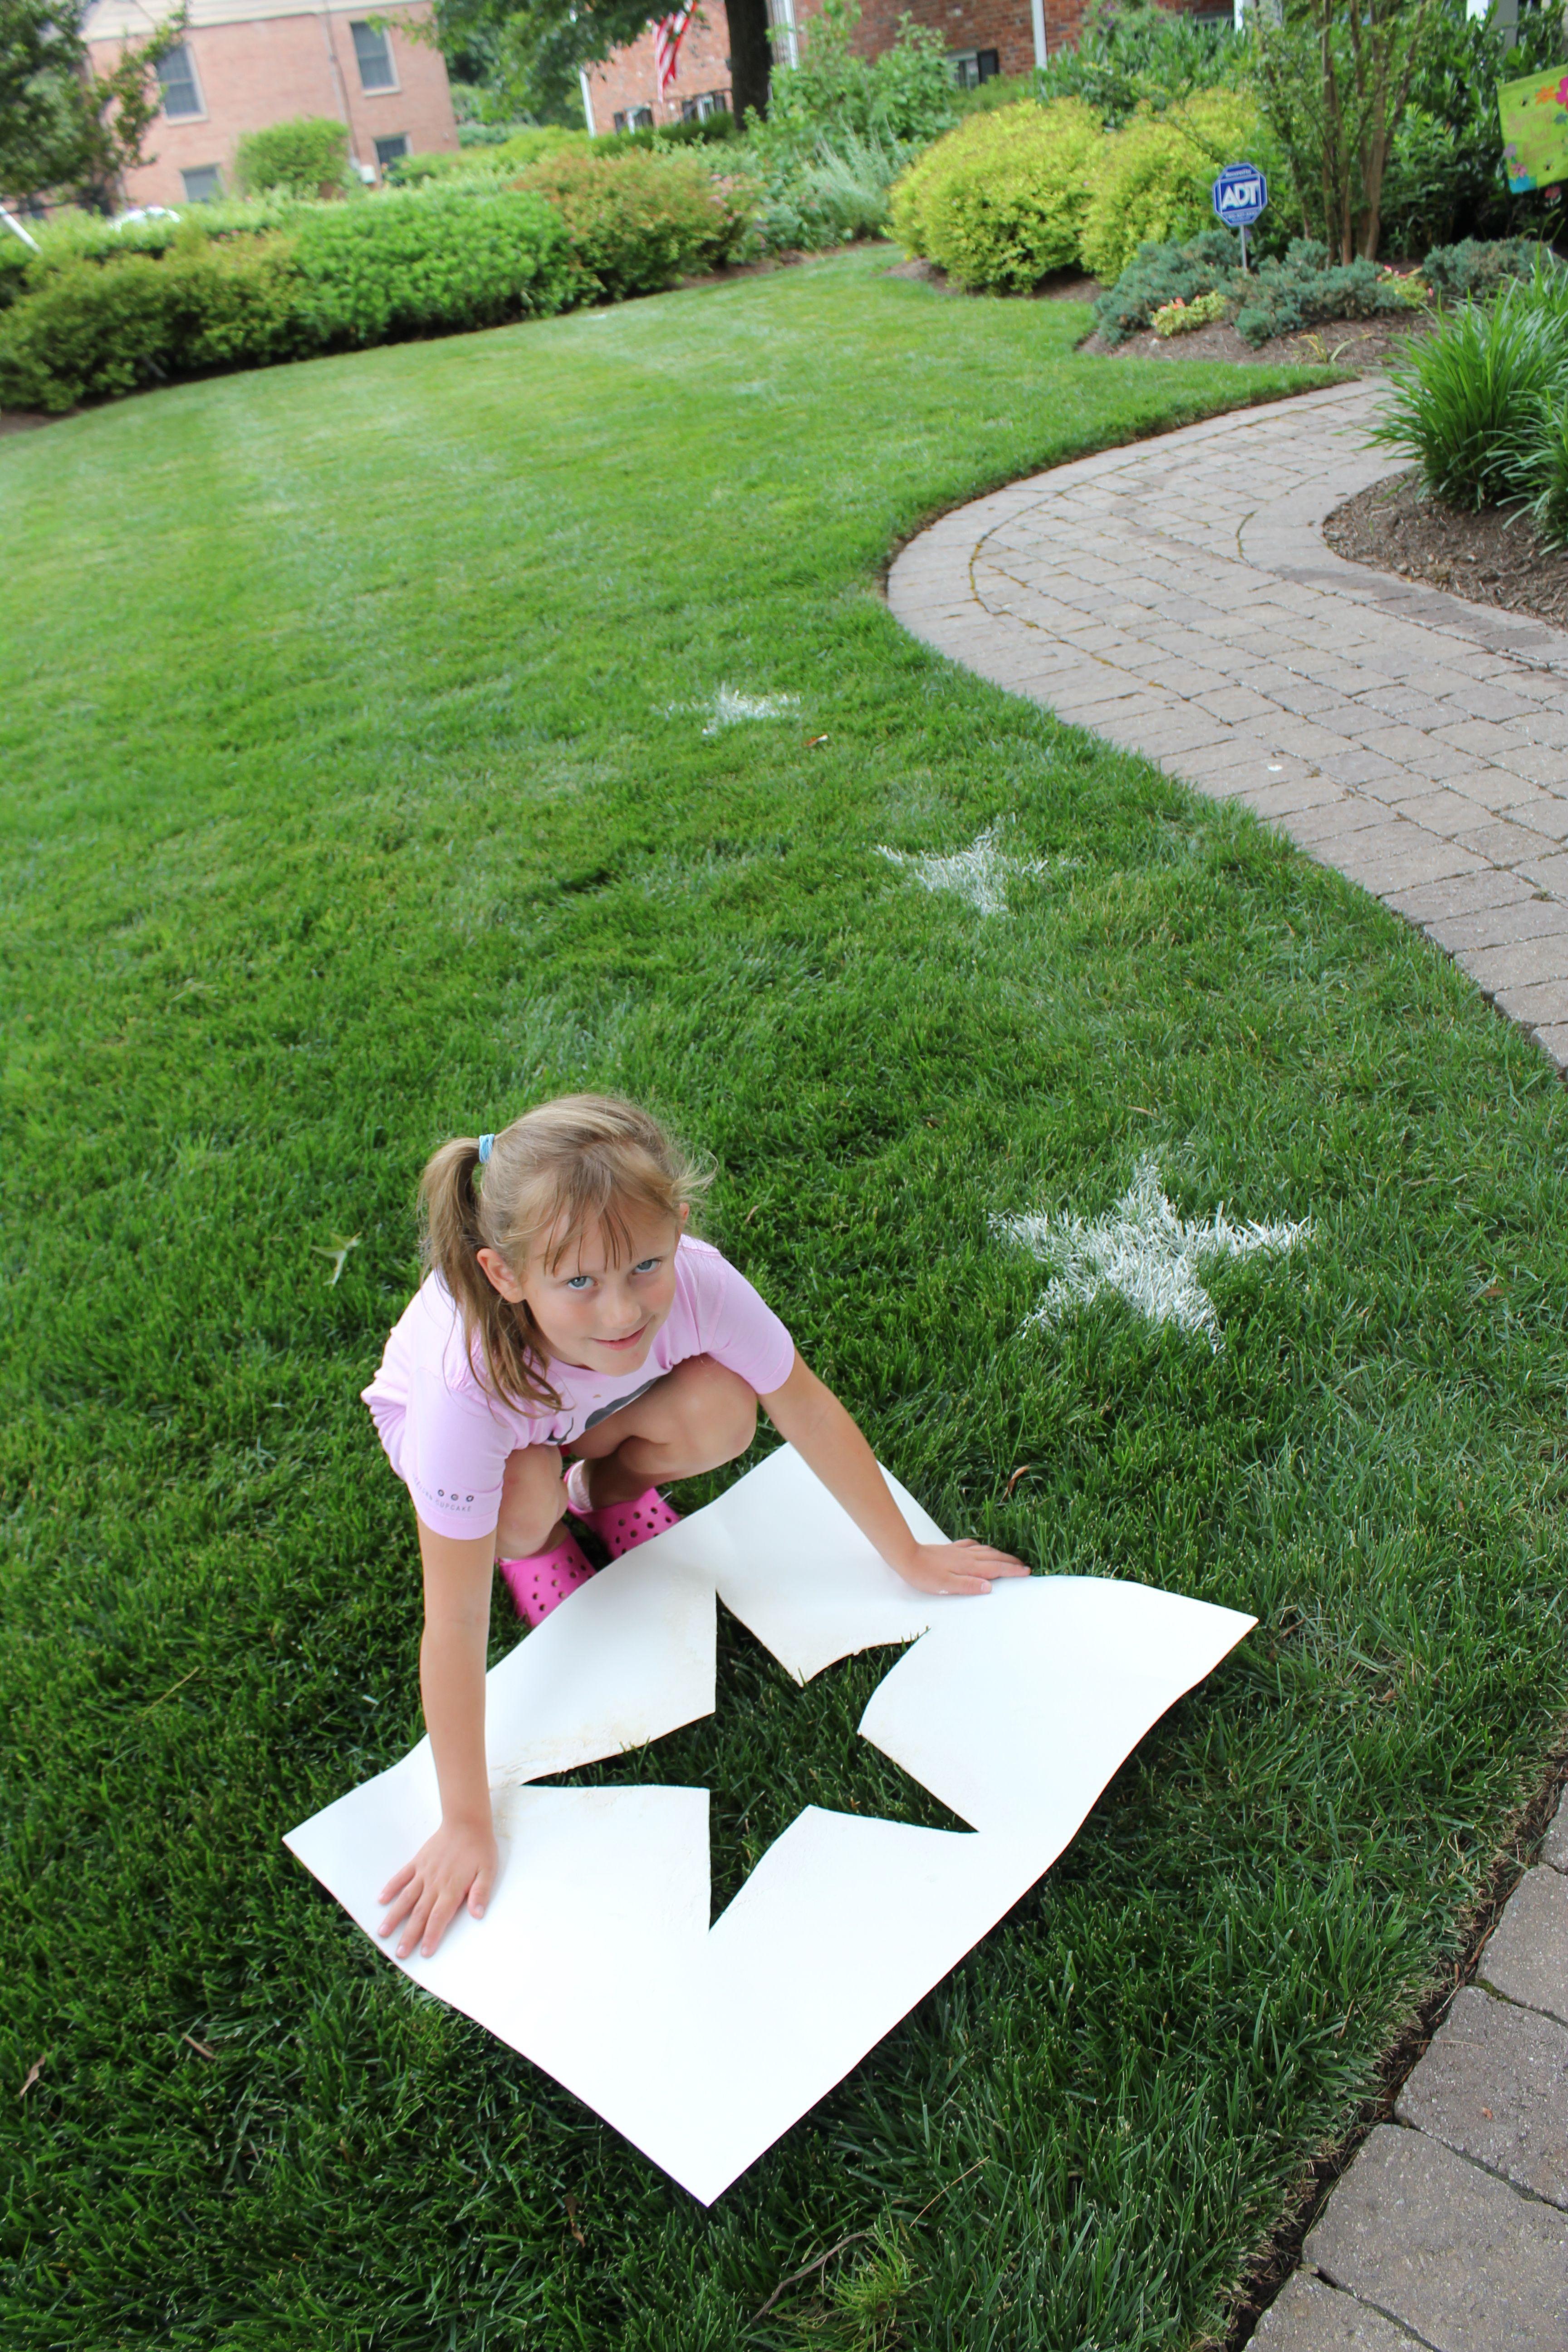 Creative Spray Paint Ideas Part - 40: Spray Painting